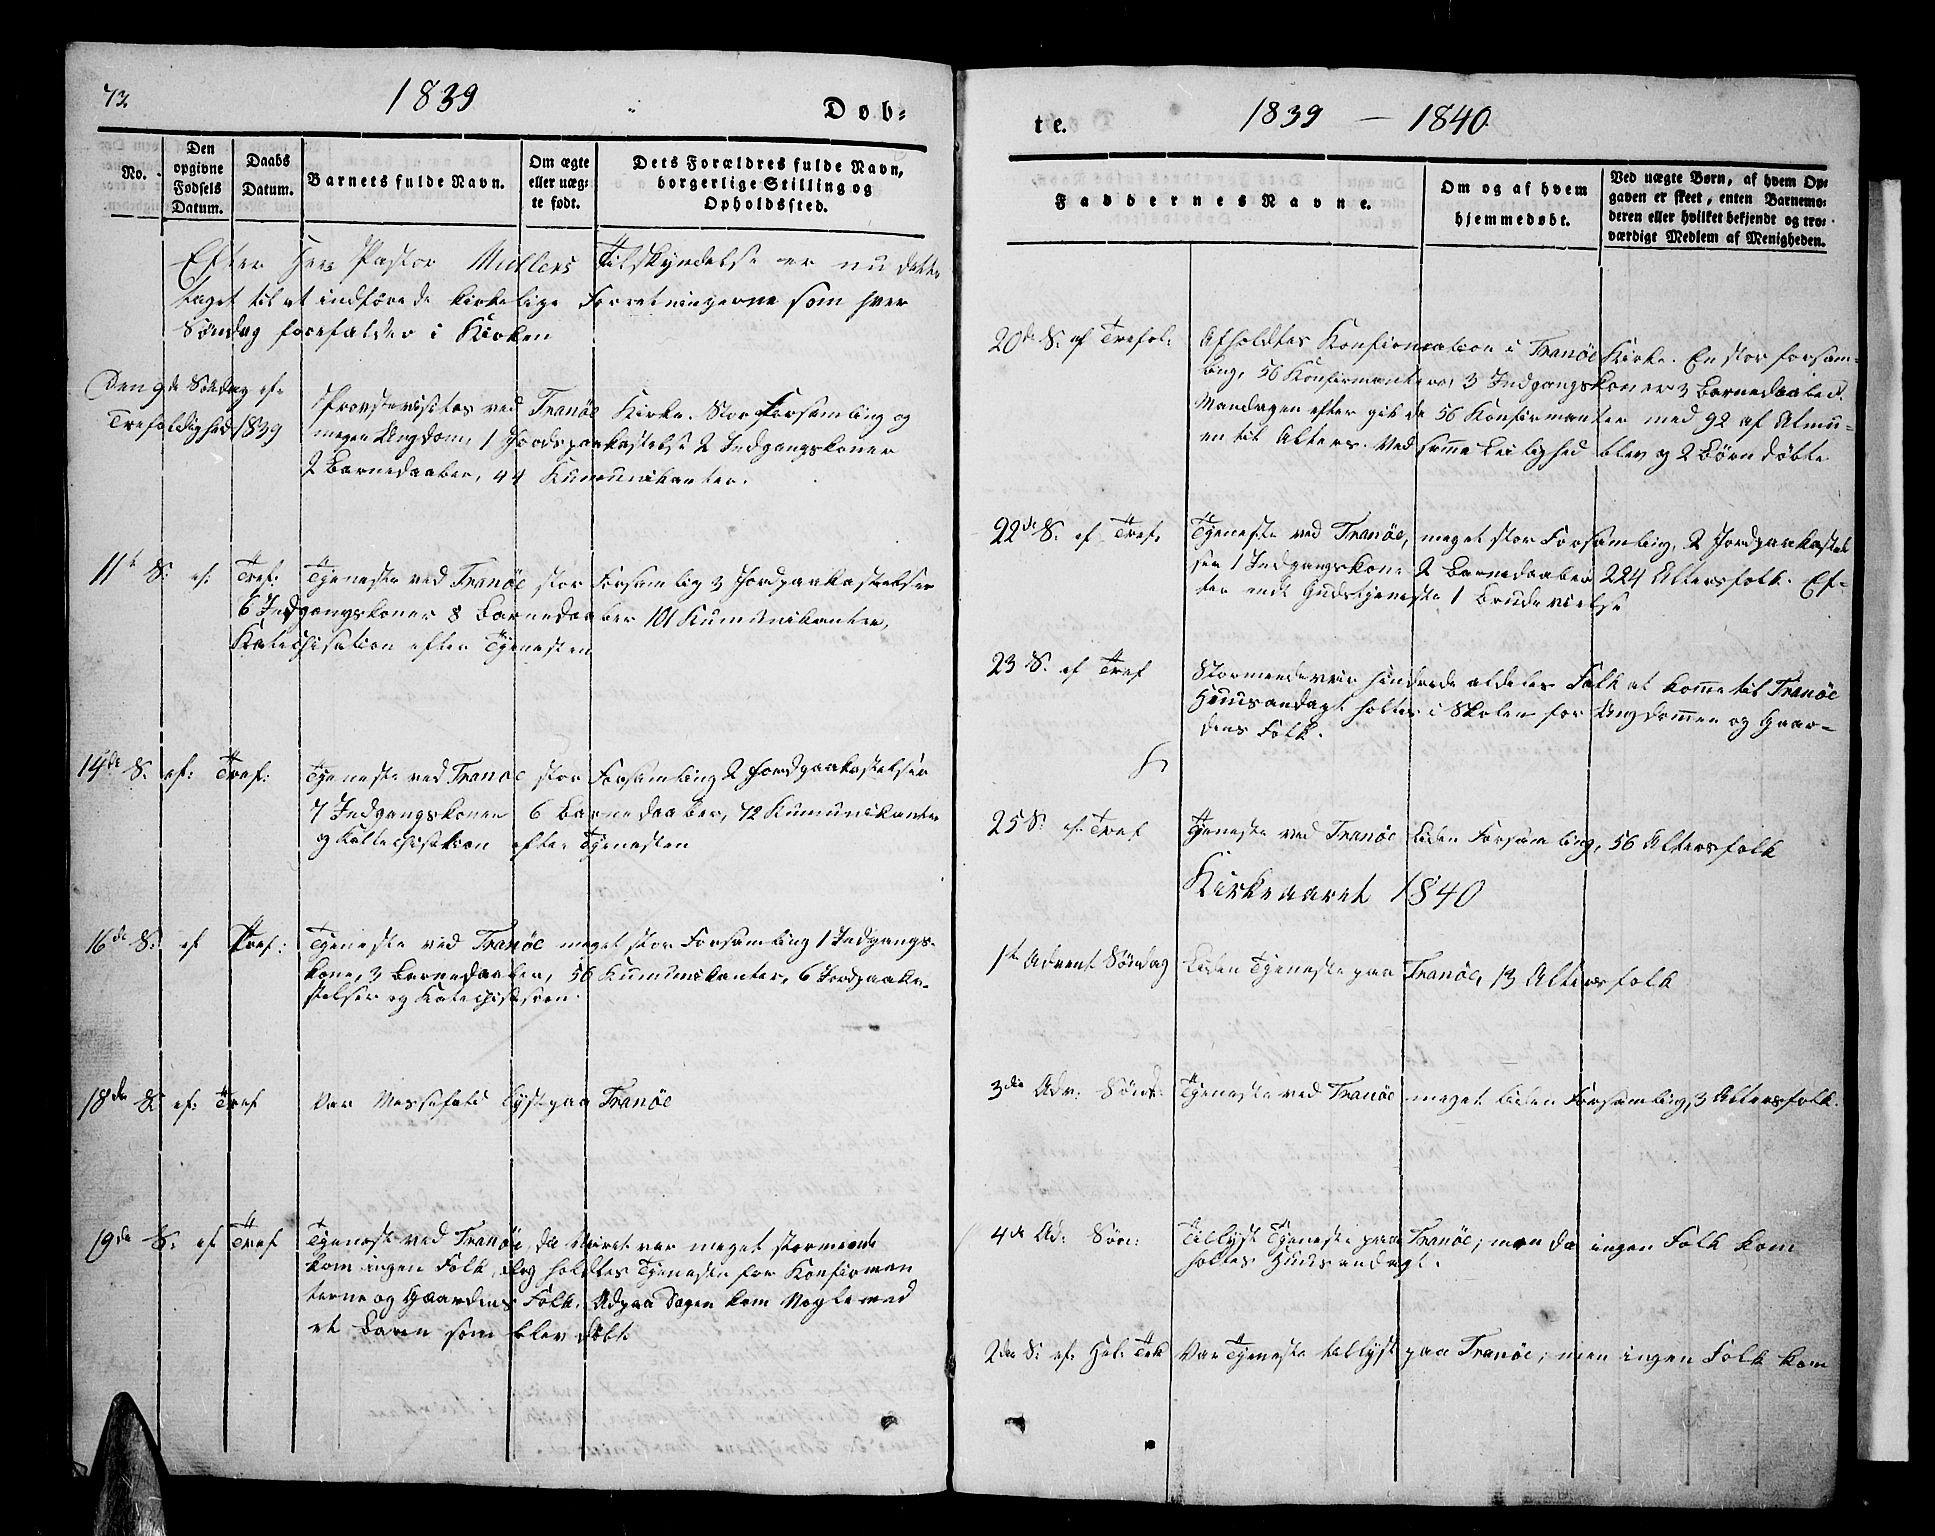 SATØ, Tranøy sokneprestkontor, I/Ia/Iab/L0001klokker: Klokkerbok nr. 1, 1835-1853, s. 73